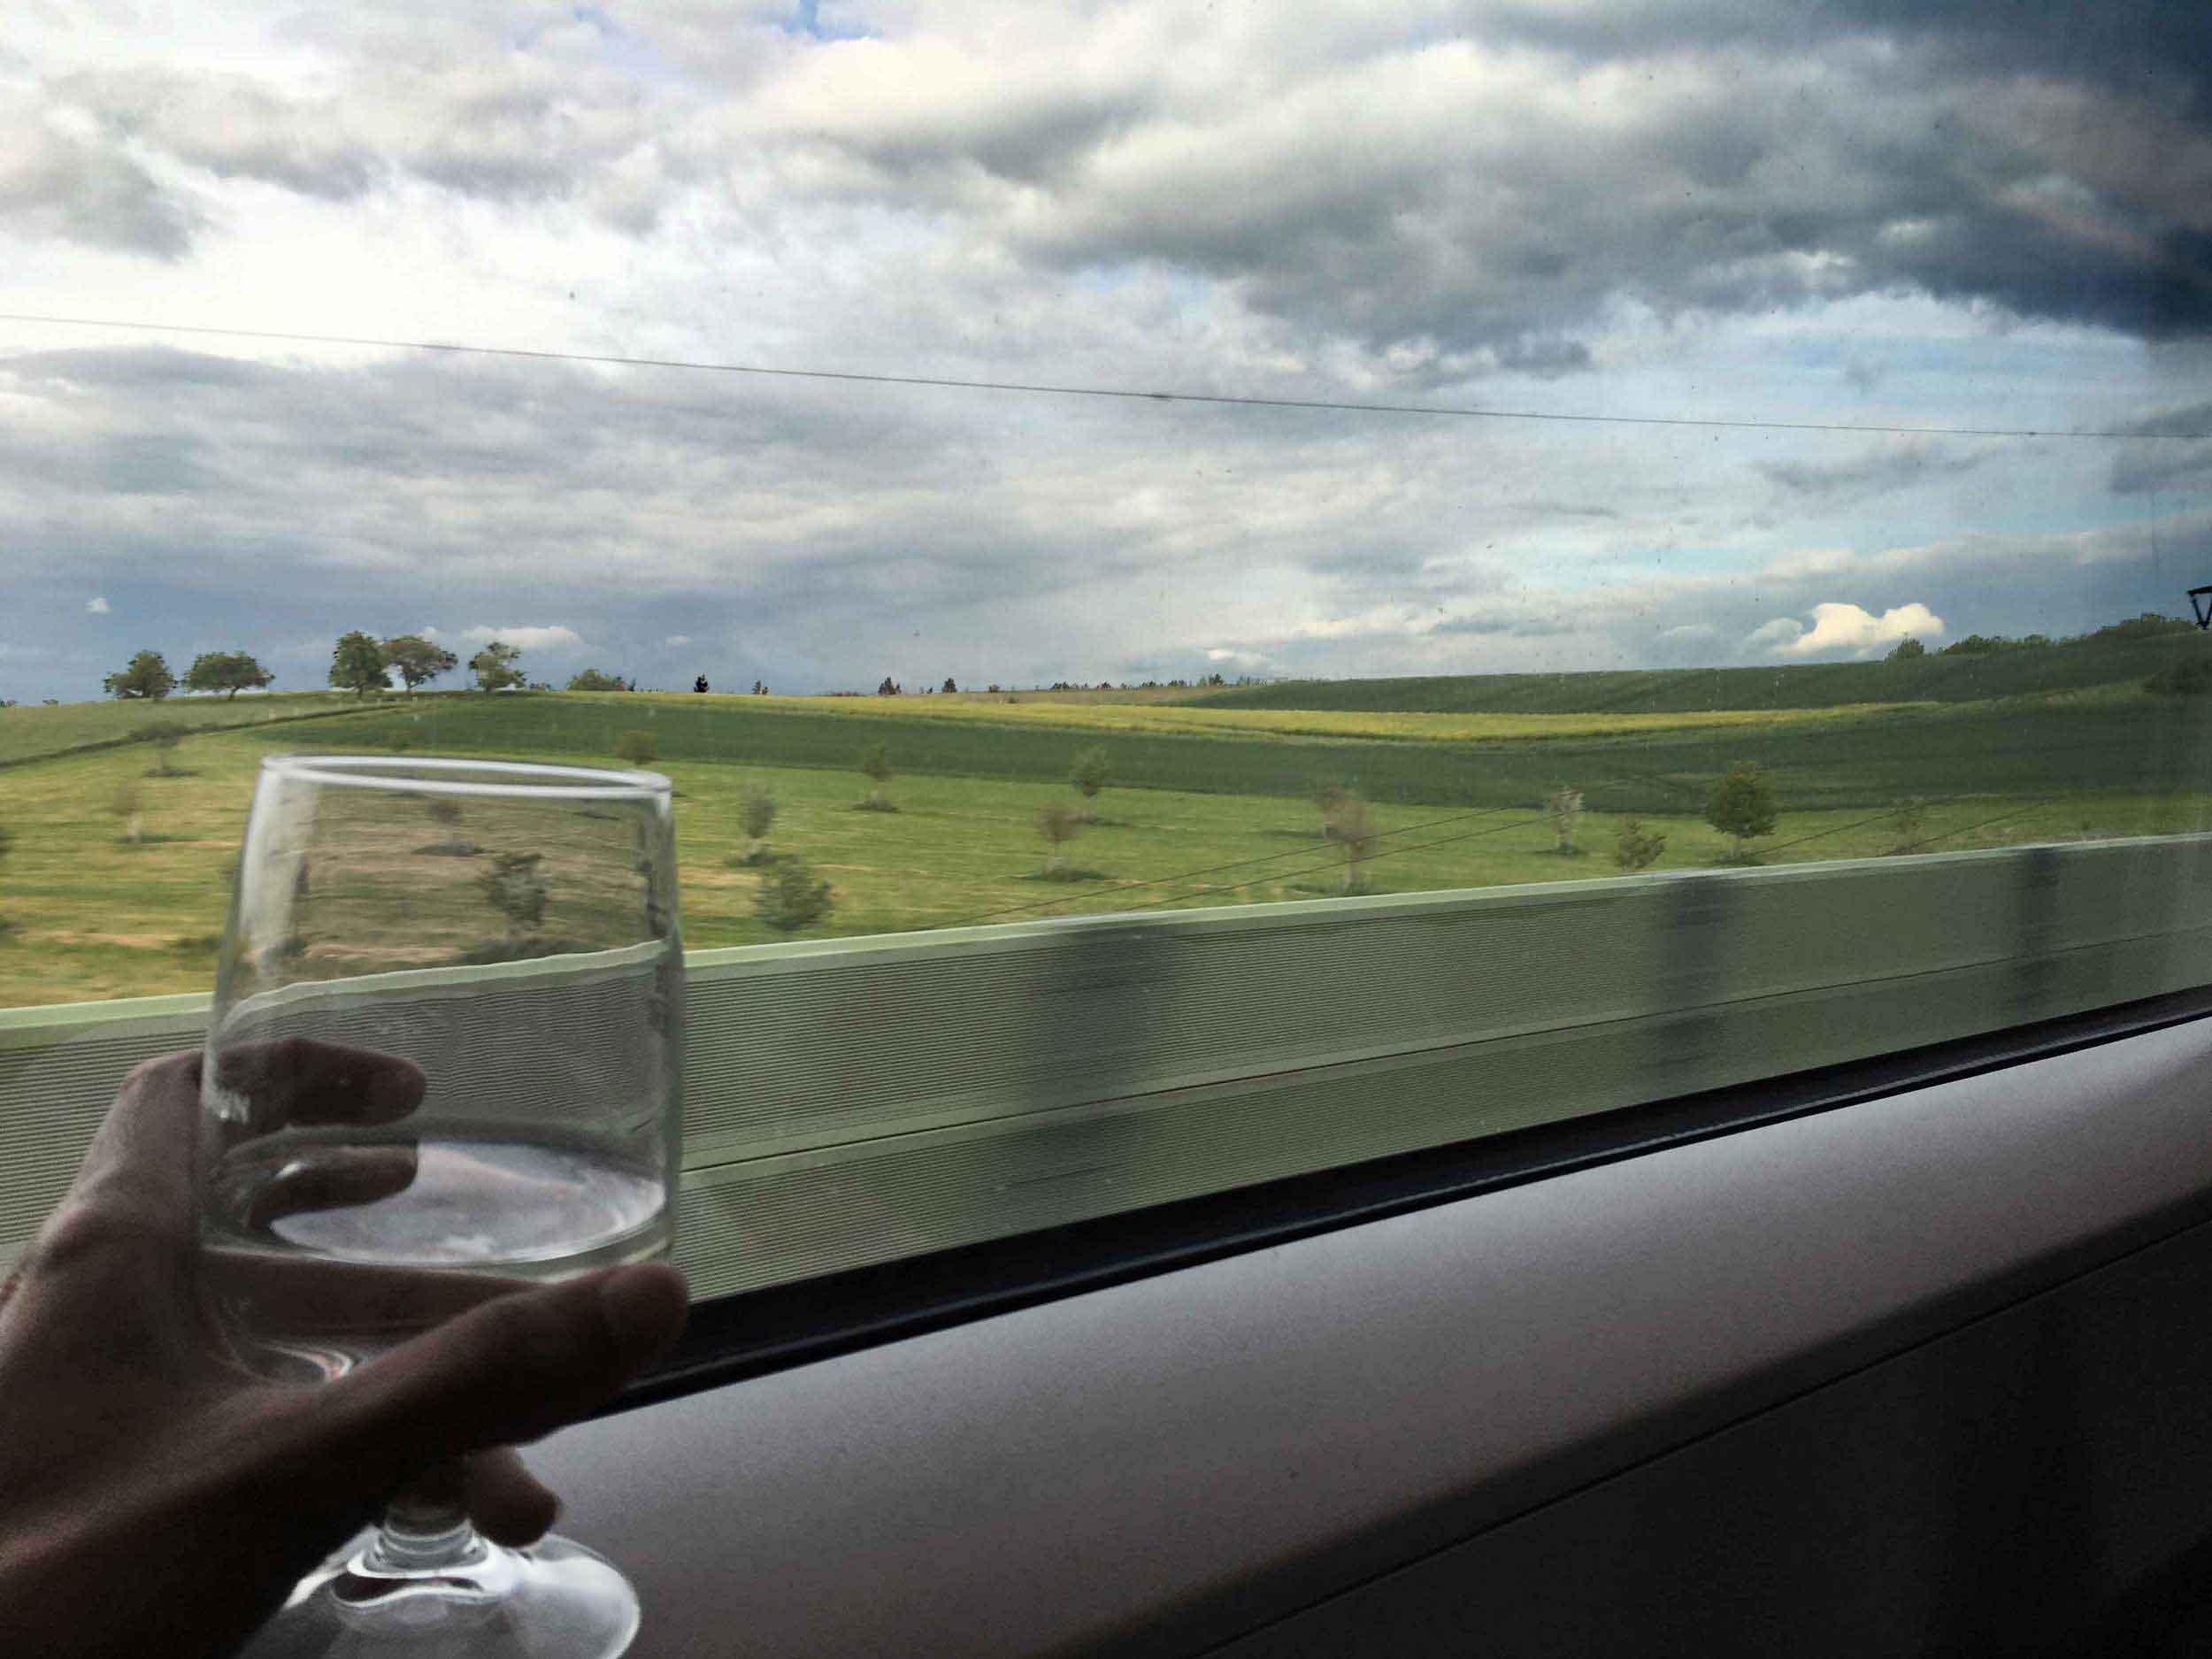 German train travel. Image©thingstodot.com